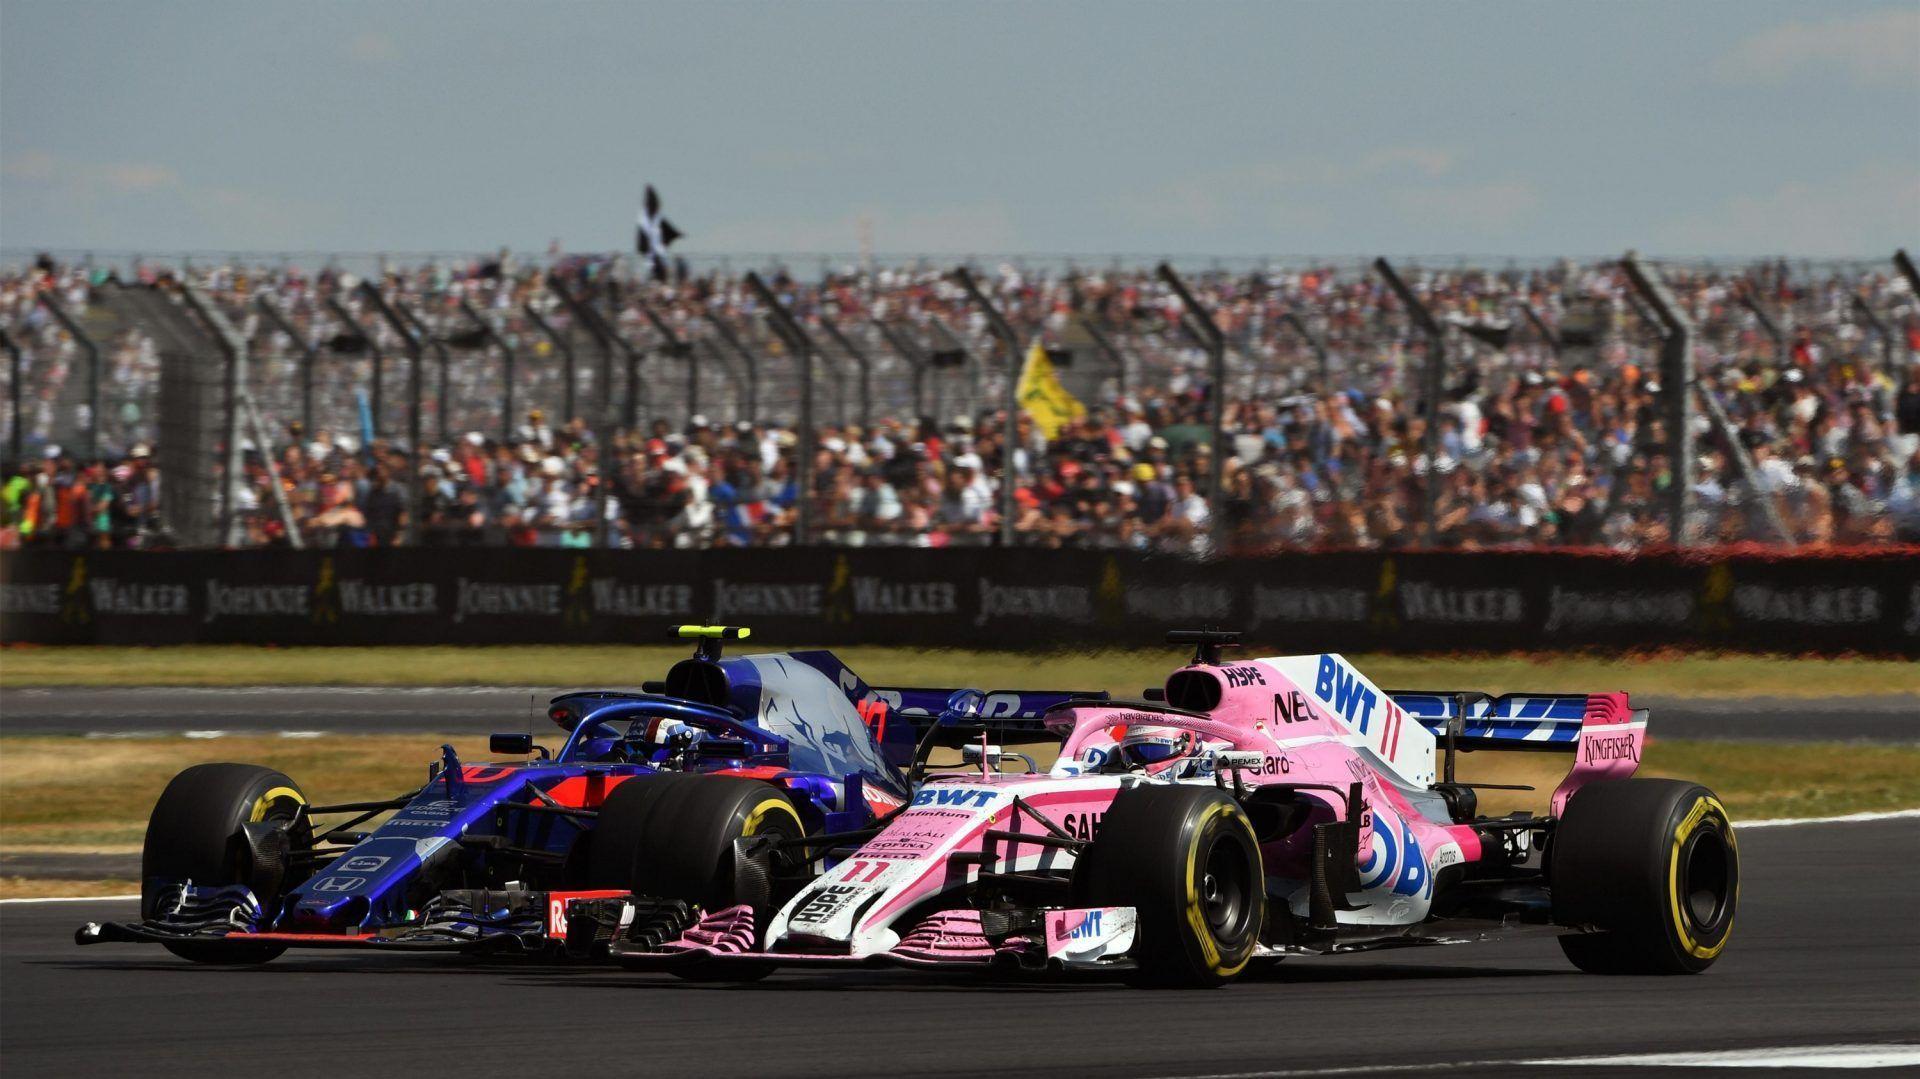 Pierre Gasly and Sergio Perez